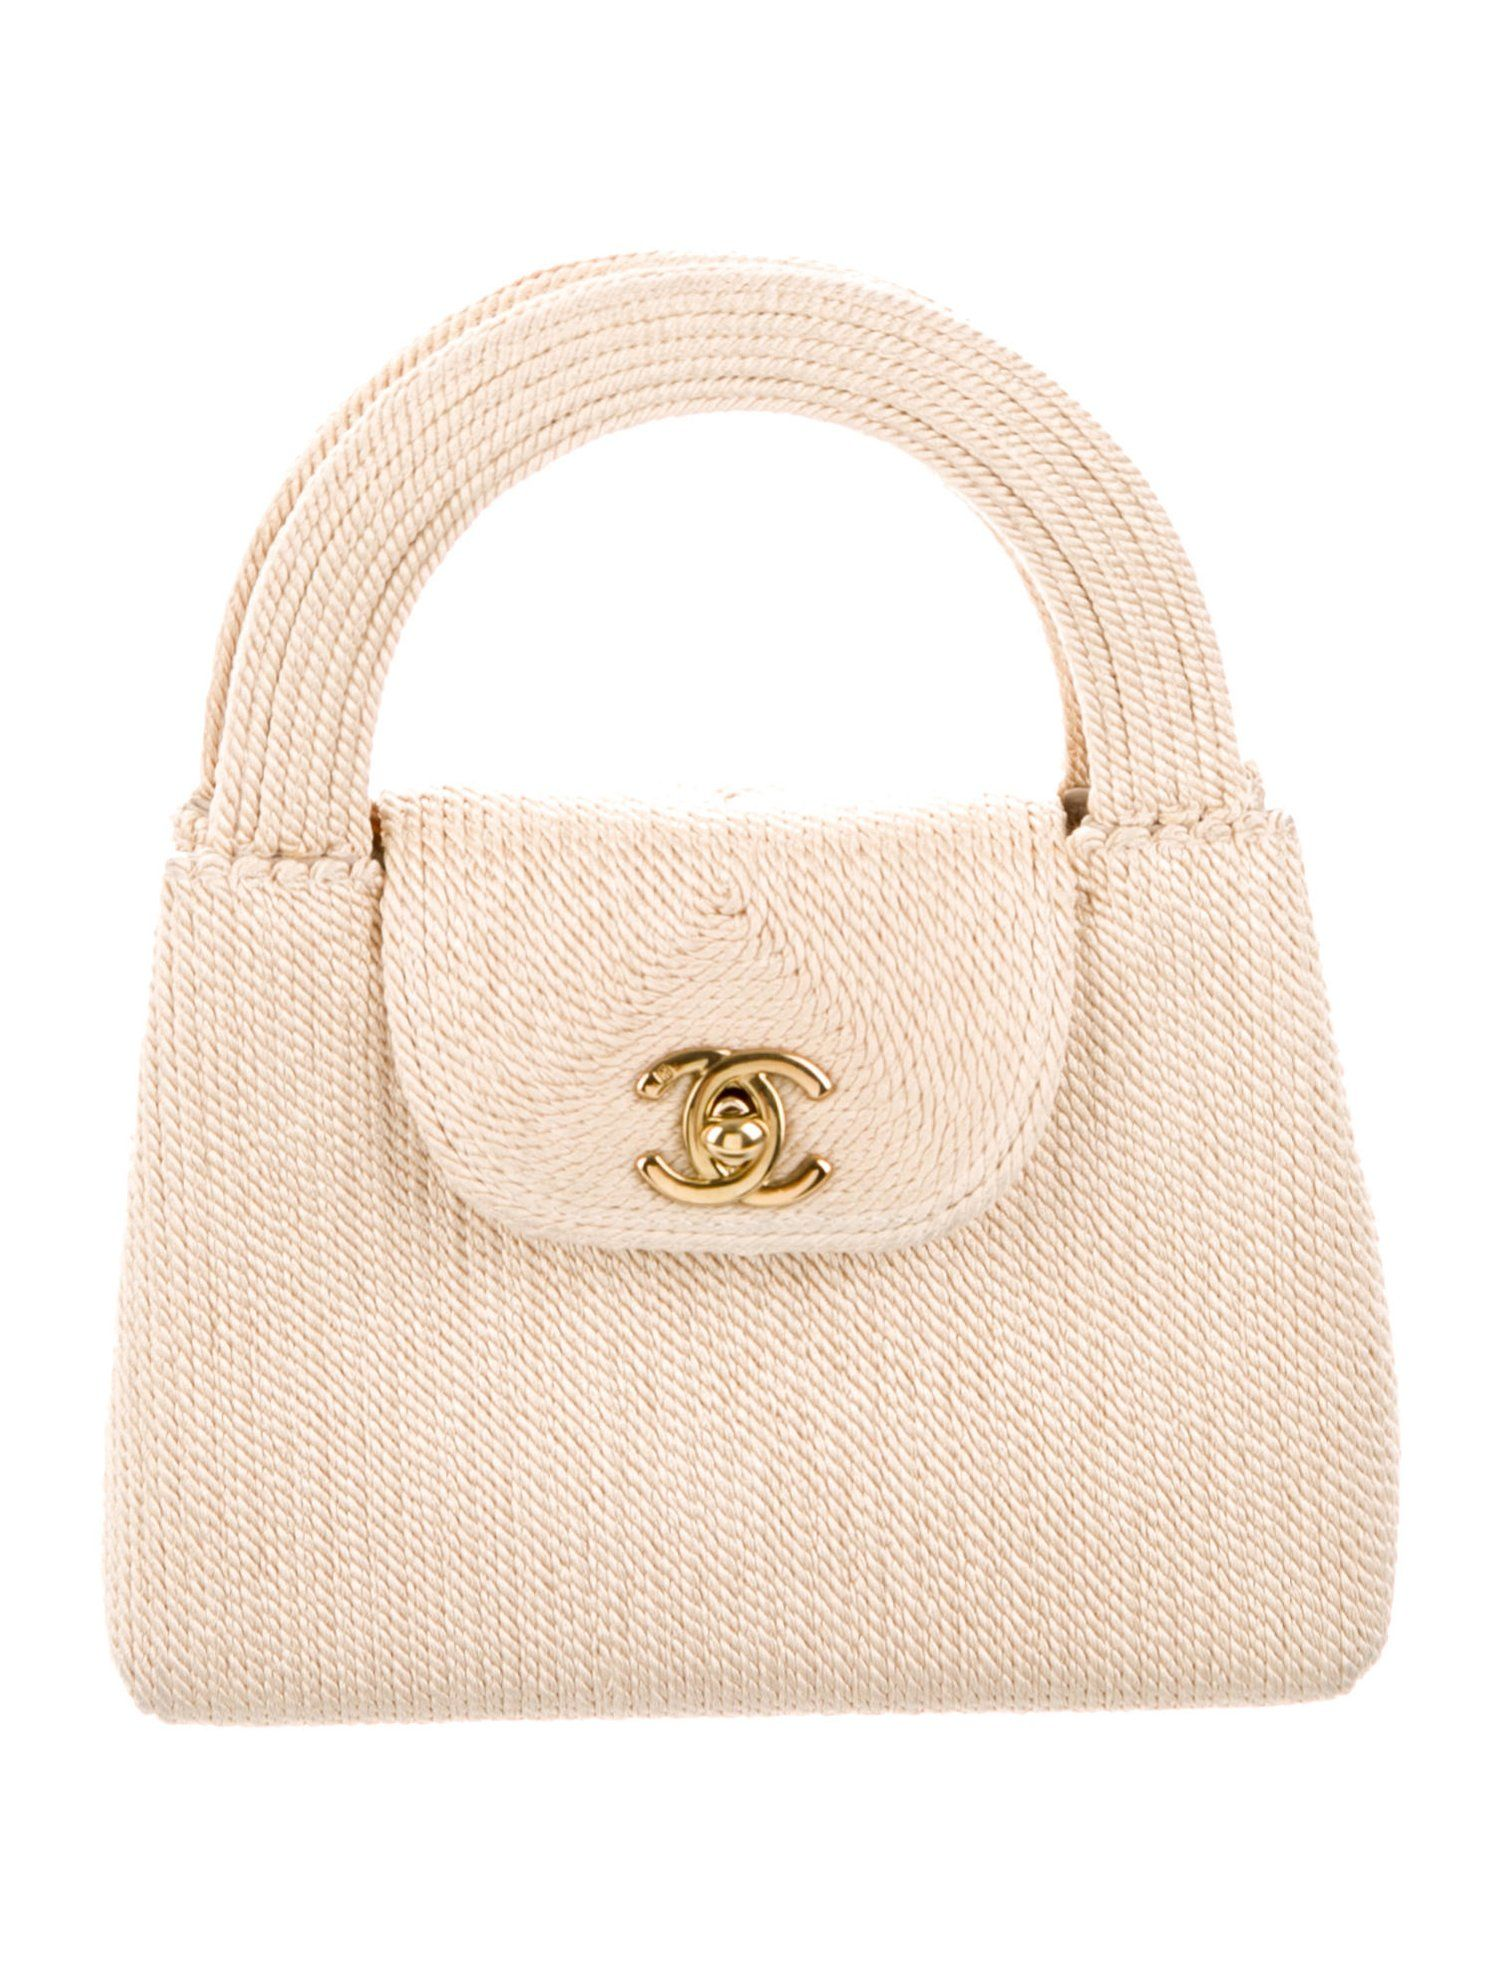 Chanel Vintage Mini Kelly Bag Handbags Cha291160 The Realreal Kelly Bag Popular Handbags Leather Handbag Purse